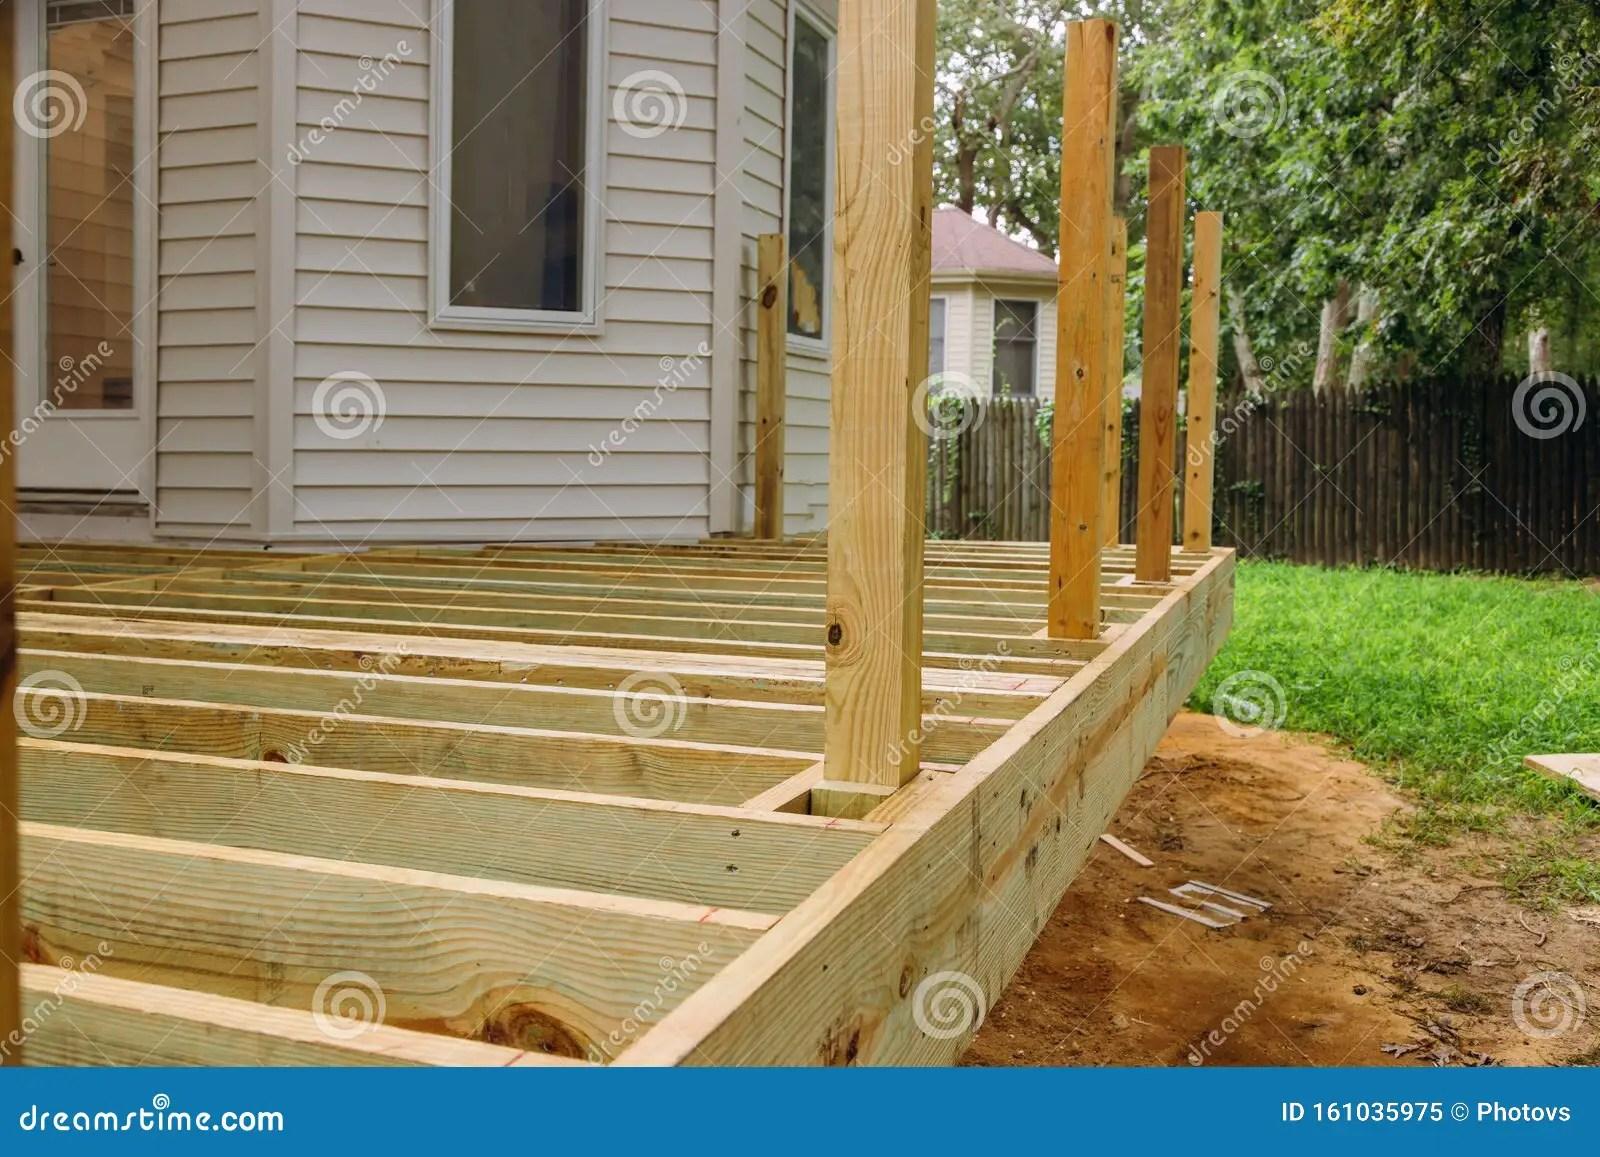 https www dreamstime com new deck patio modern wooden deck installing wood floor patio new deck patio modern wooden deck image161035975